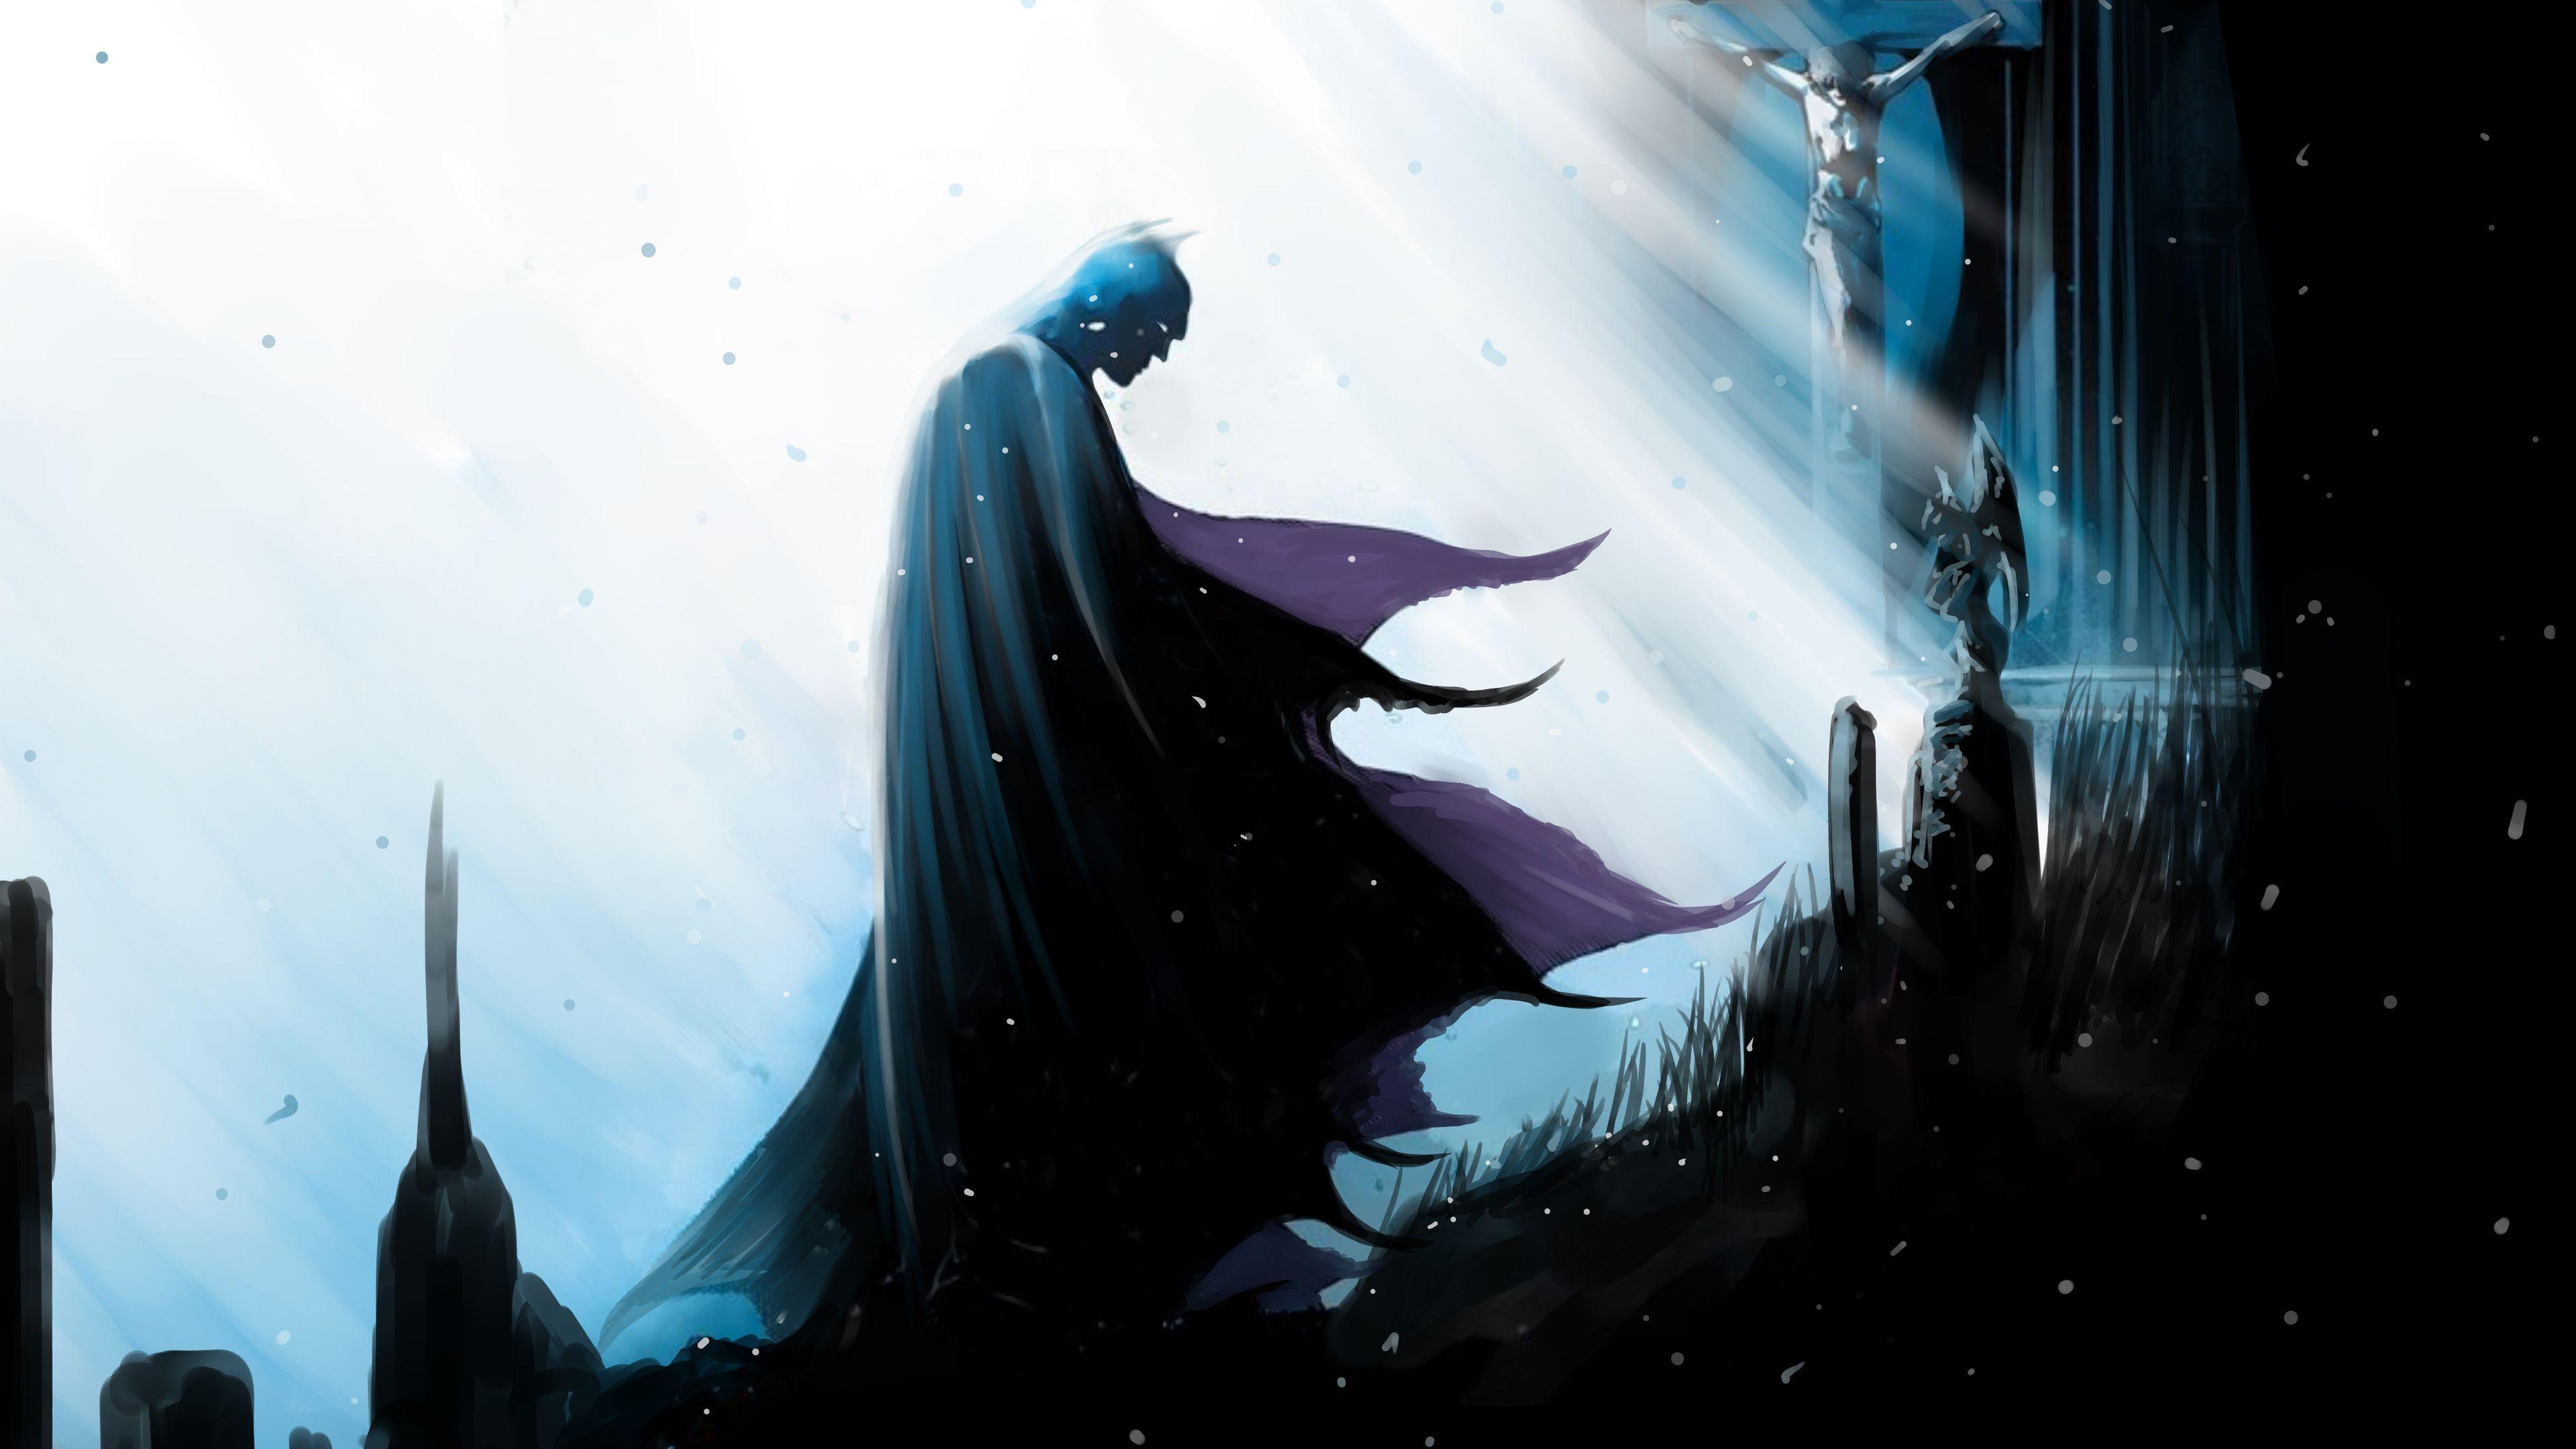 Batman Paint Art 4k Superheroes Wallpapers Hd Wallpapers Digital Art Wallpapers Batman Wallpapers Artwork Wallpapers 4k Batman Wallpapers Art Art Painting